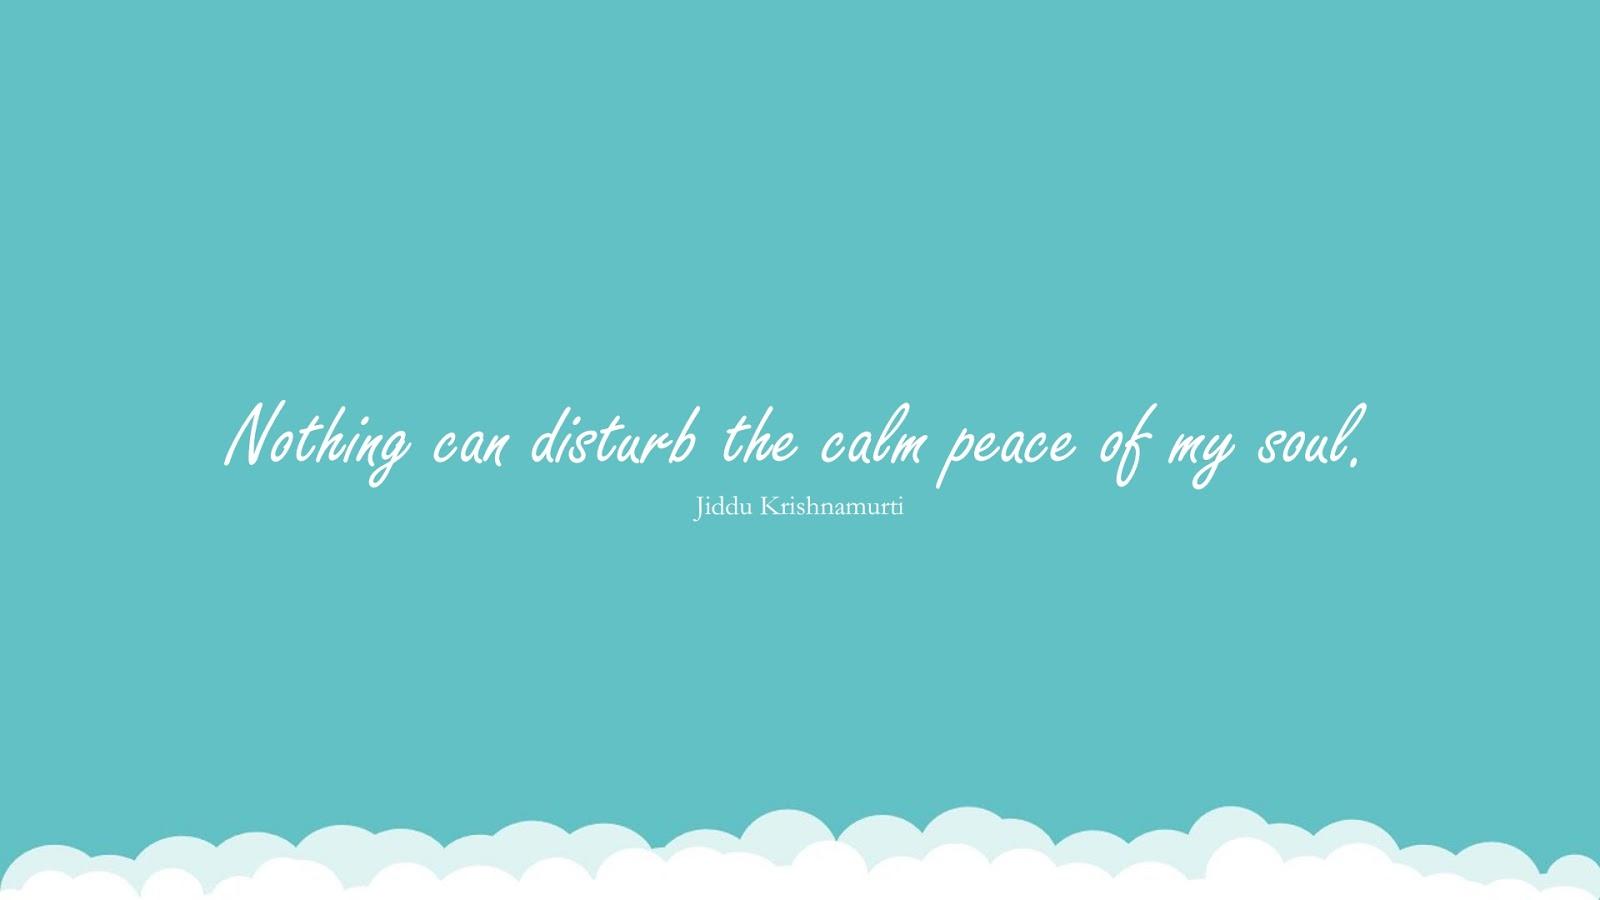 Nothing can disturb the calm peace of my soul. (Jiddu Krishnamurti);  #CalmQuotes